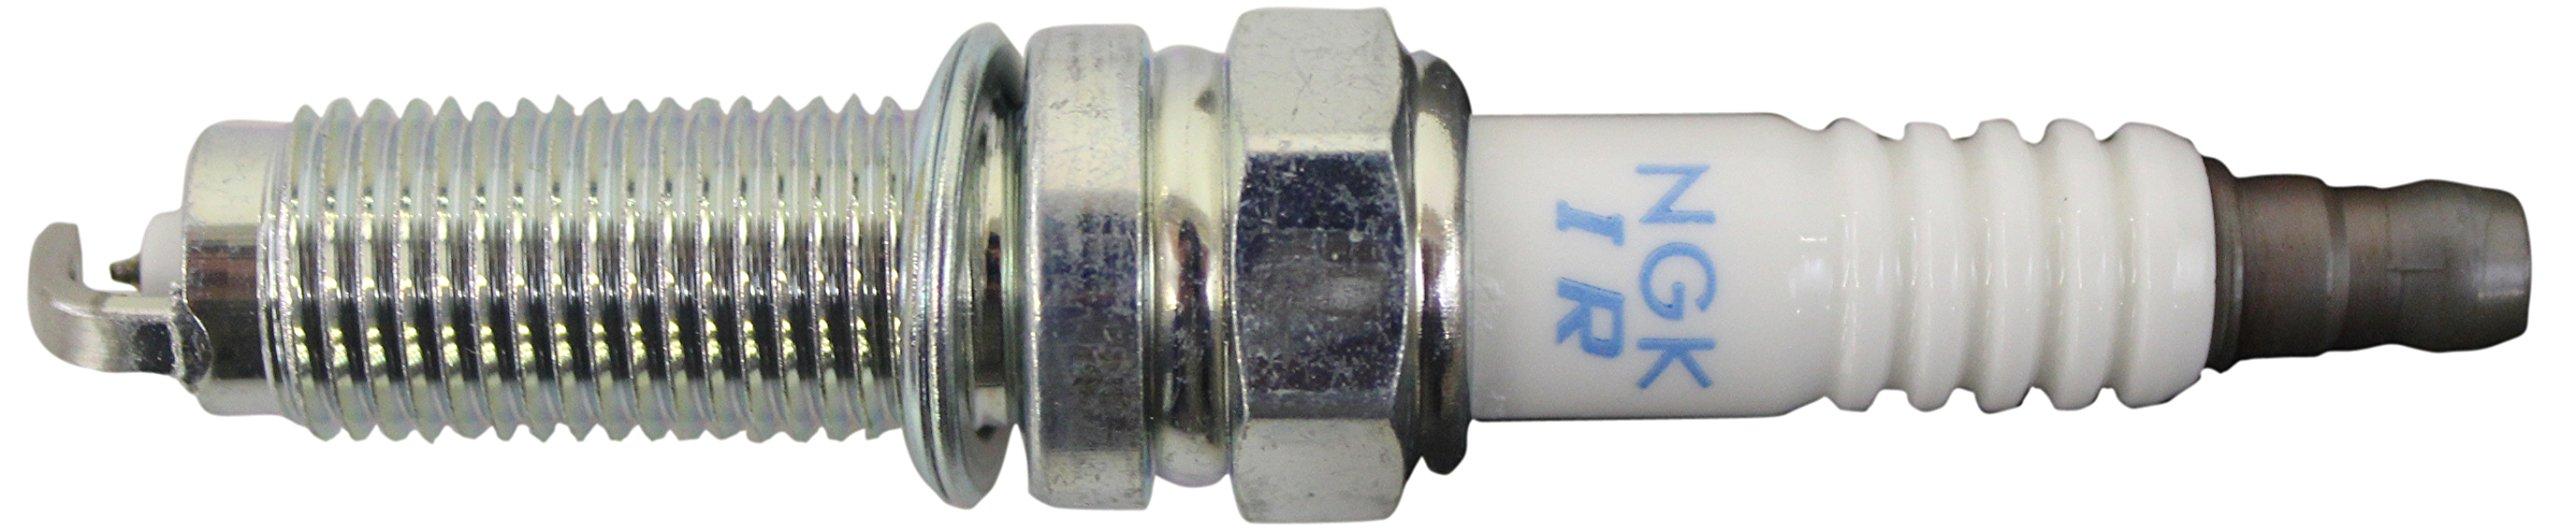 Honda Genuine 12290-R70-A01 Spark Plug